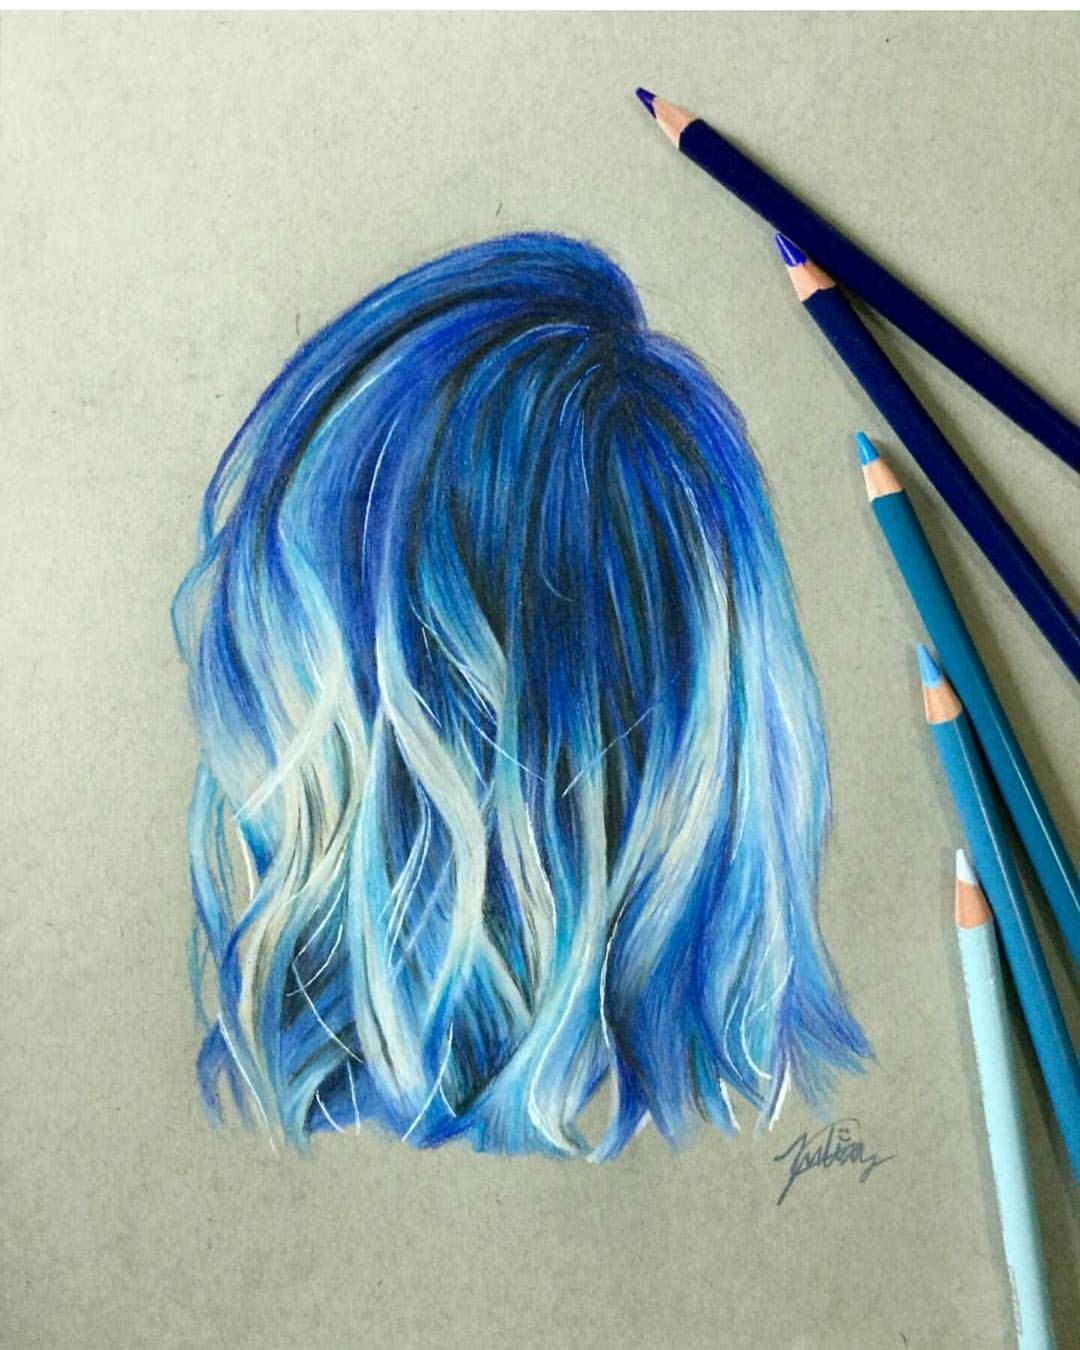 28 5k Likes 82 Comments University Art Artistuniversity On Instagram Blue Hair Study By Julenium Follow J Tech Art How To Draw Hair Art Drawings